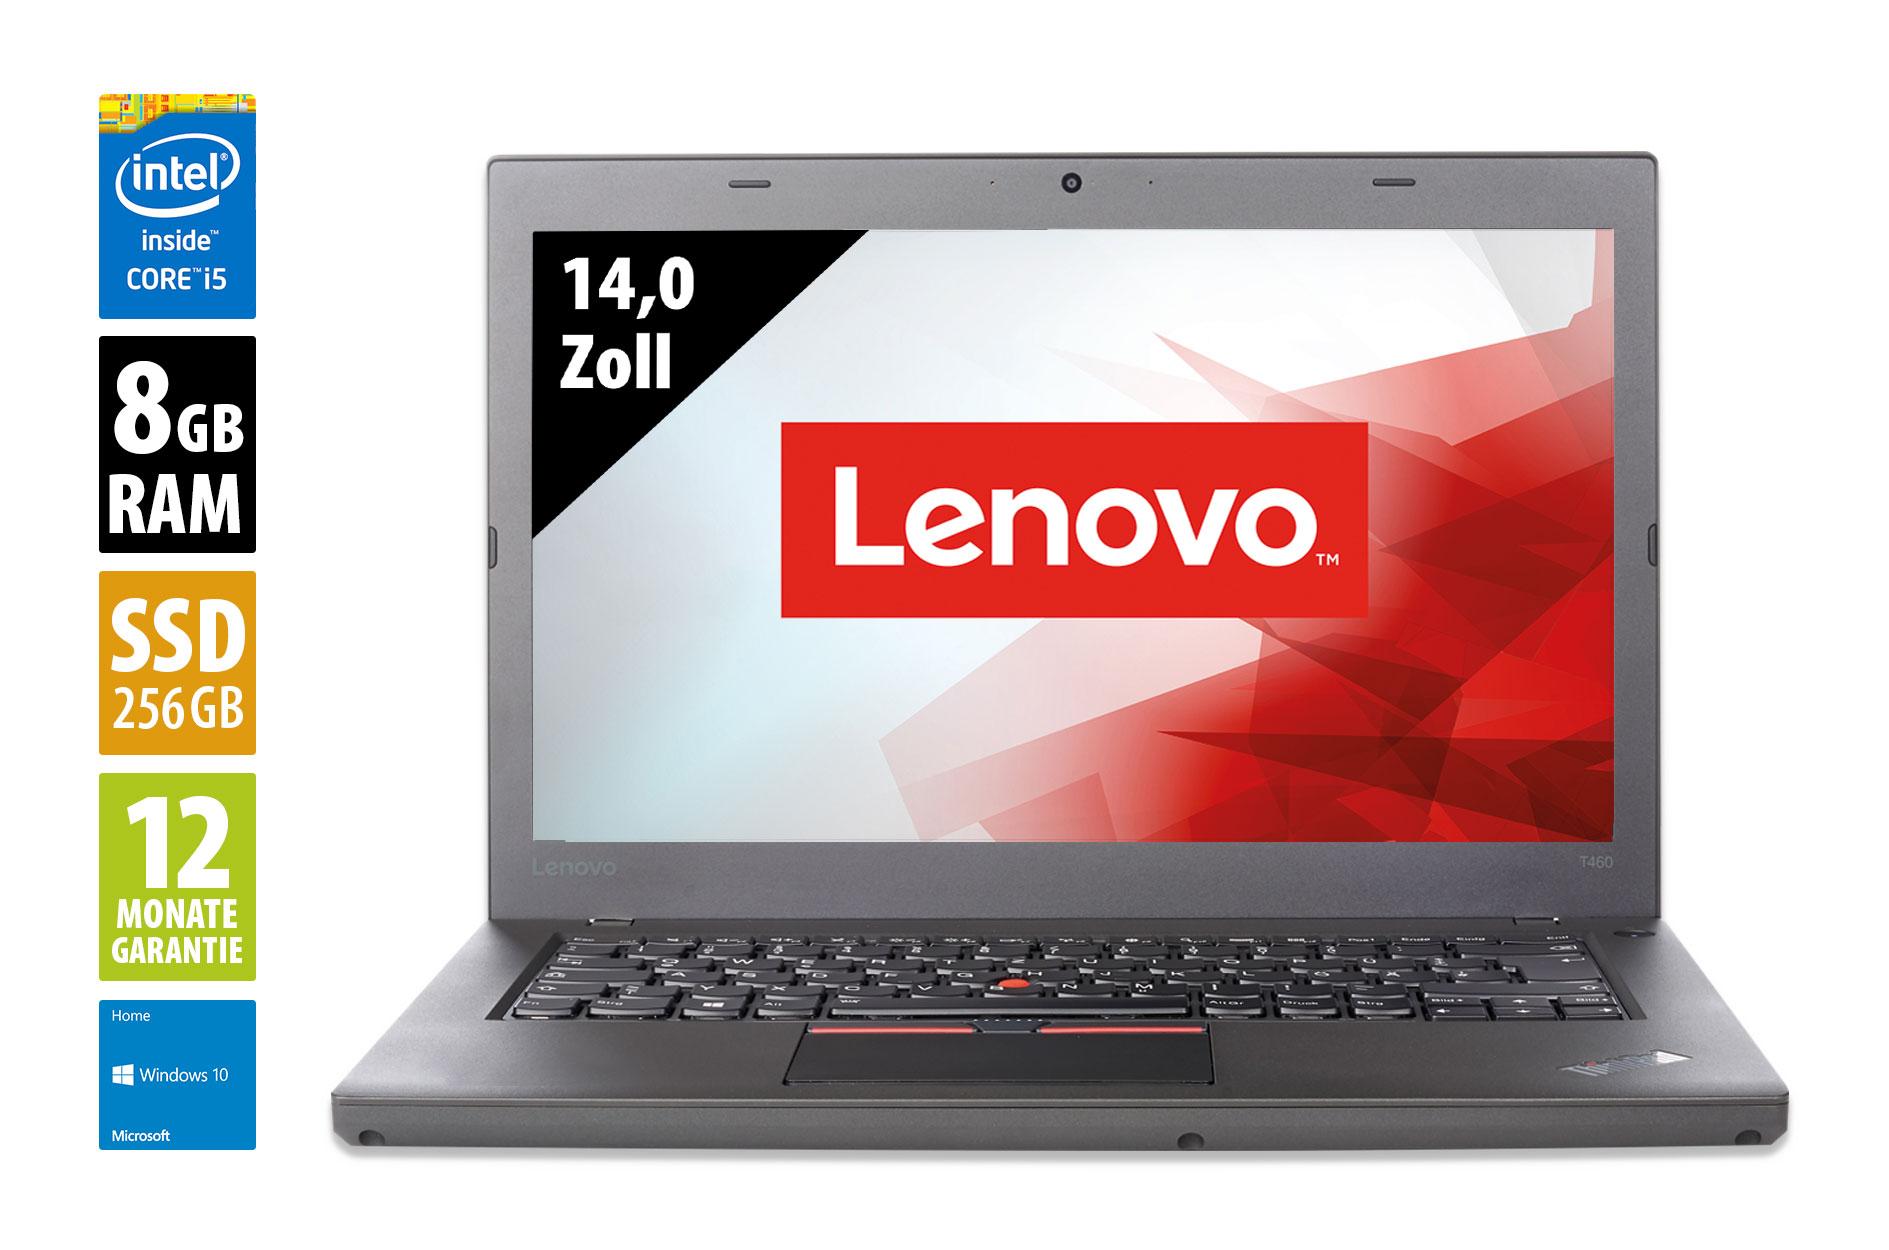 Lenovo ThinkPad T460 14 Zoll Notebook - Core i5-6300U @ 2,4 GHz - 8GB RAM - 256GB SSD - FHD (1920x1080) Grade A